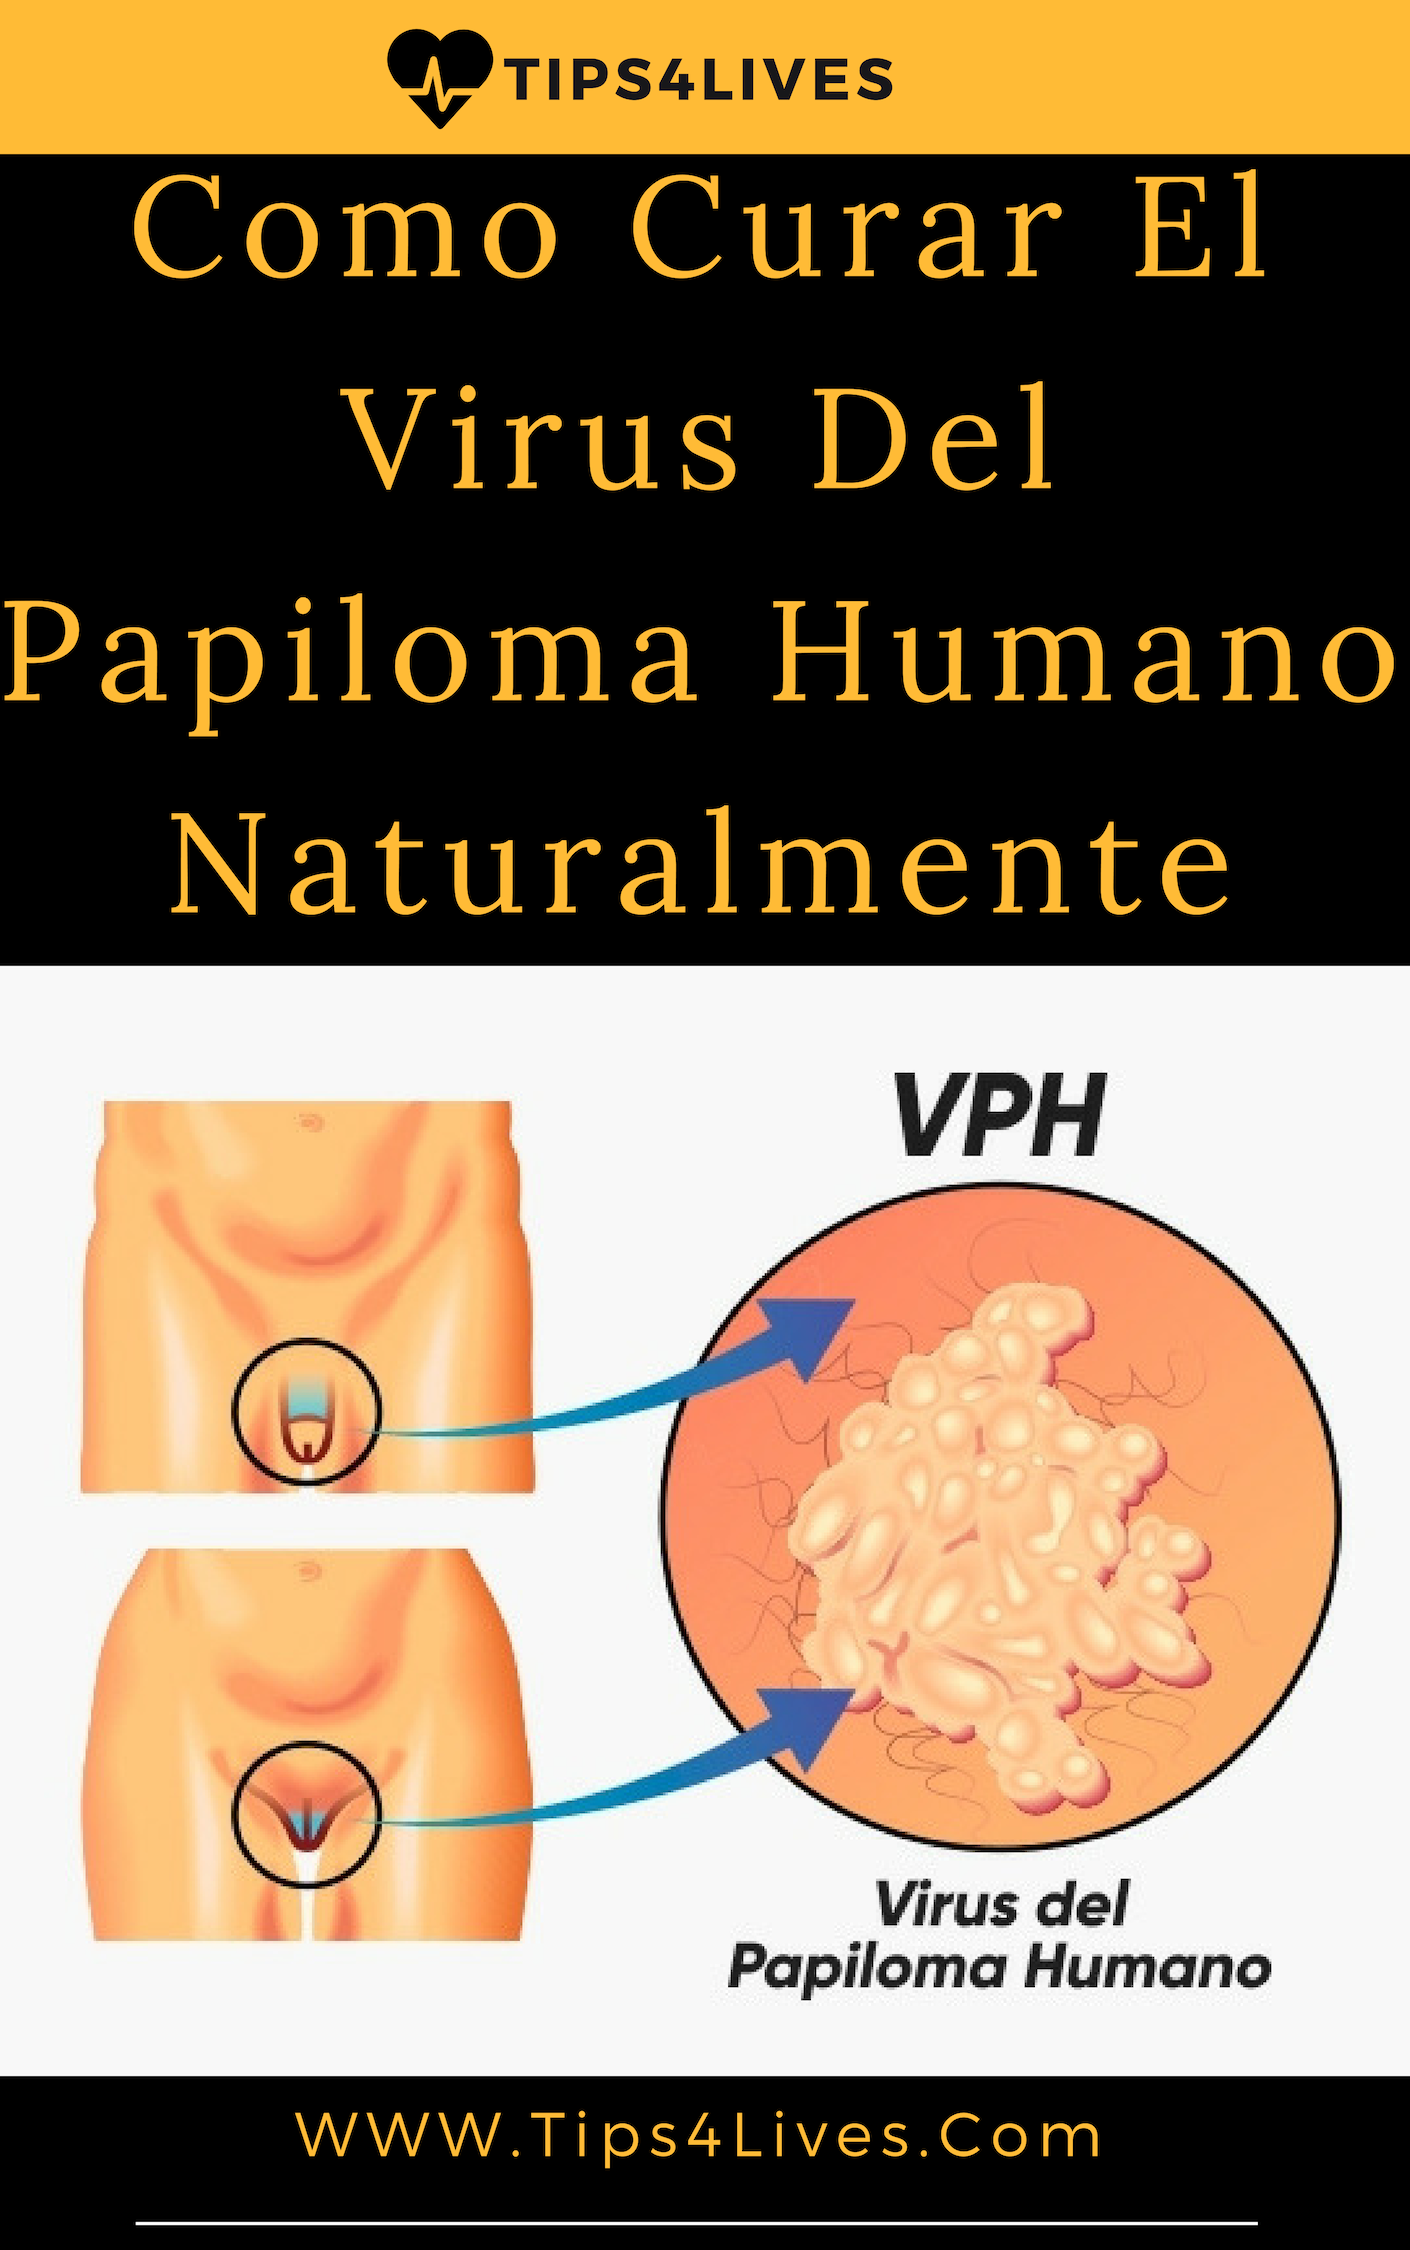 virus del papiloma tratamiento en hombres hpv - human papillomavirus test positive